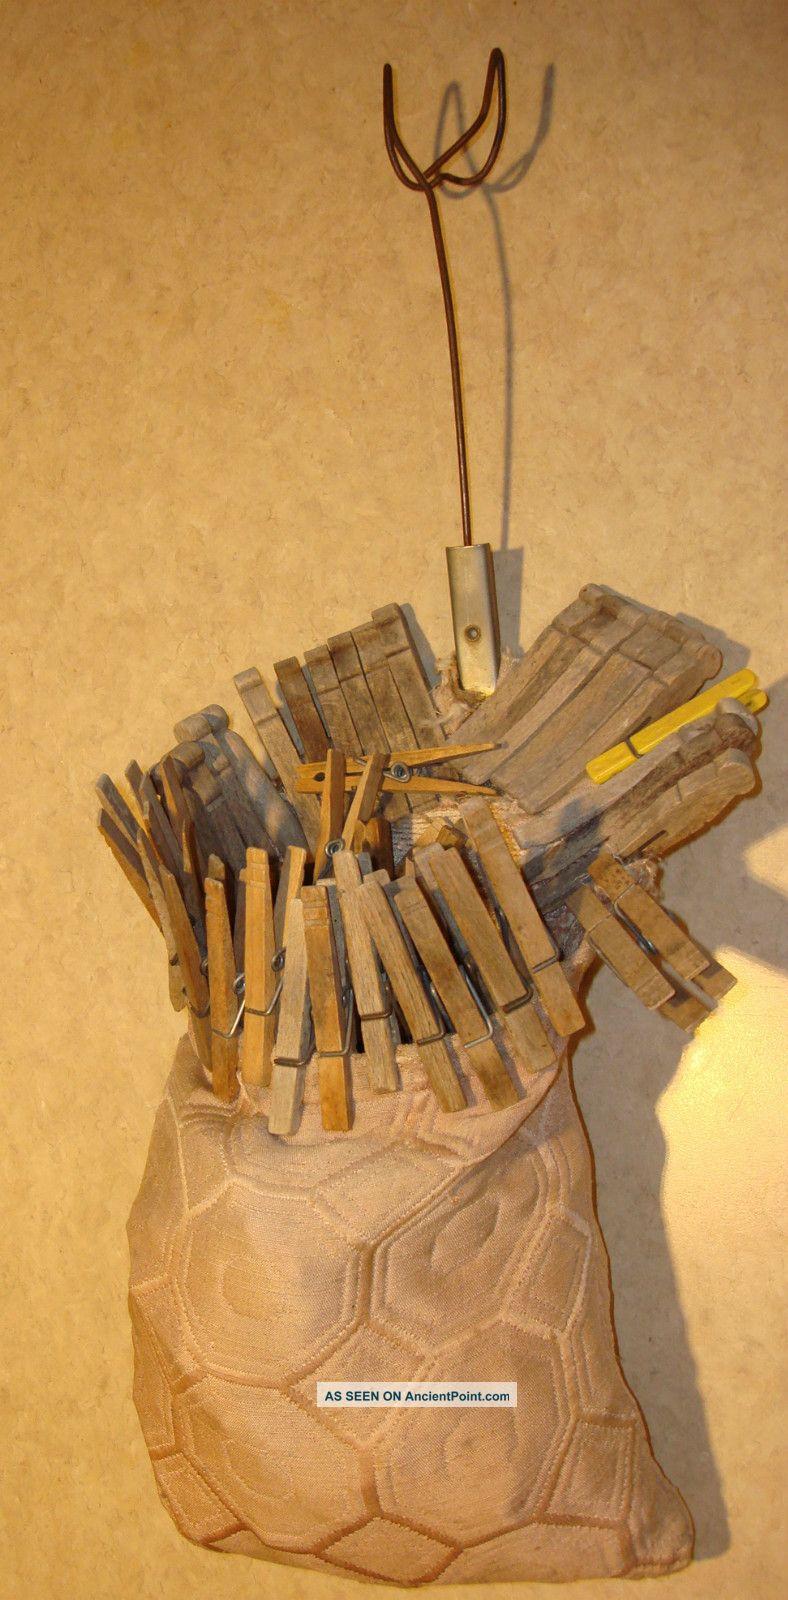 Vintage Wooden Clothes Pins And Vintage Bag Primitives photo